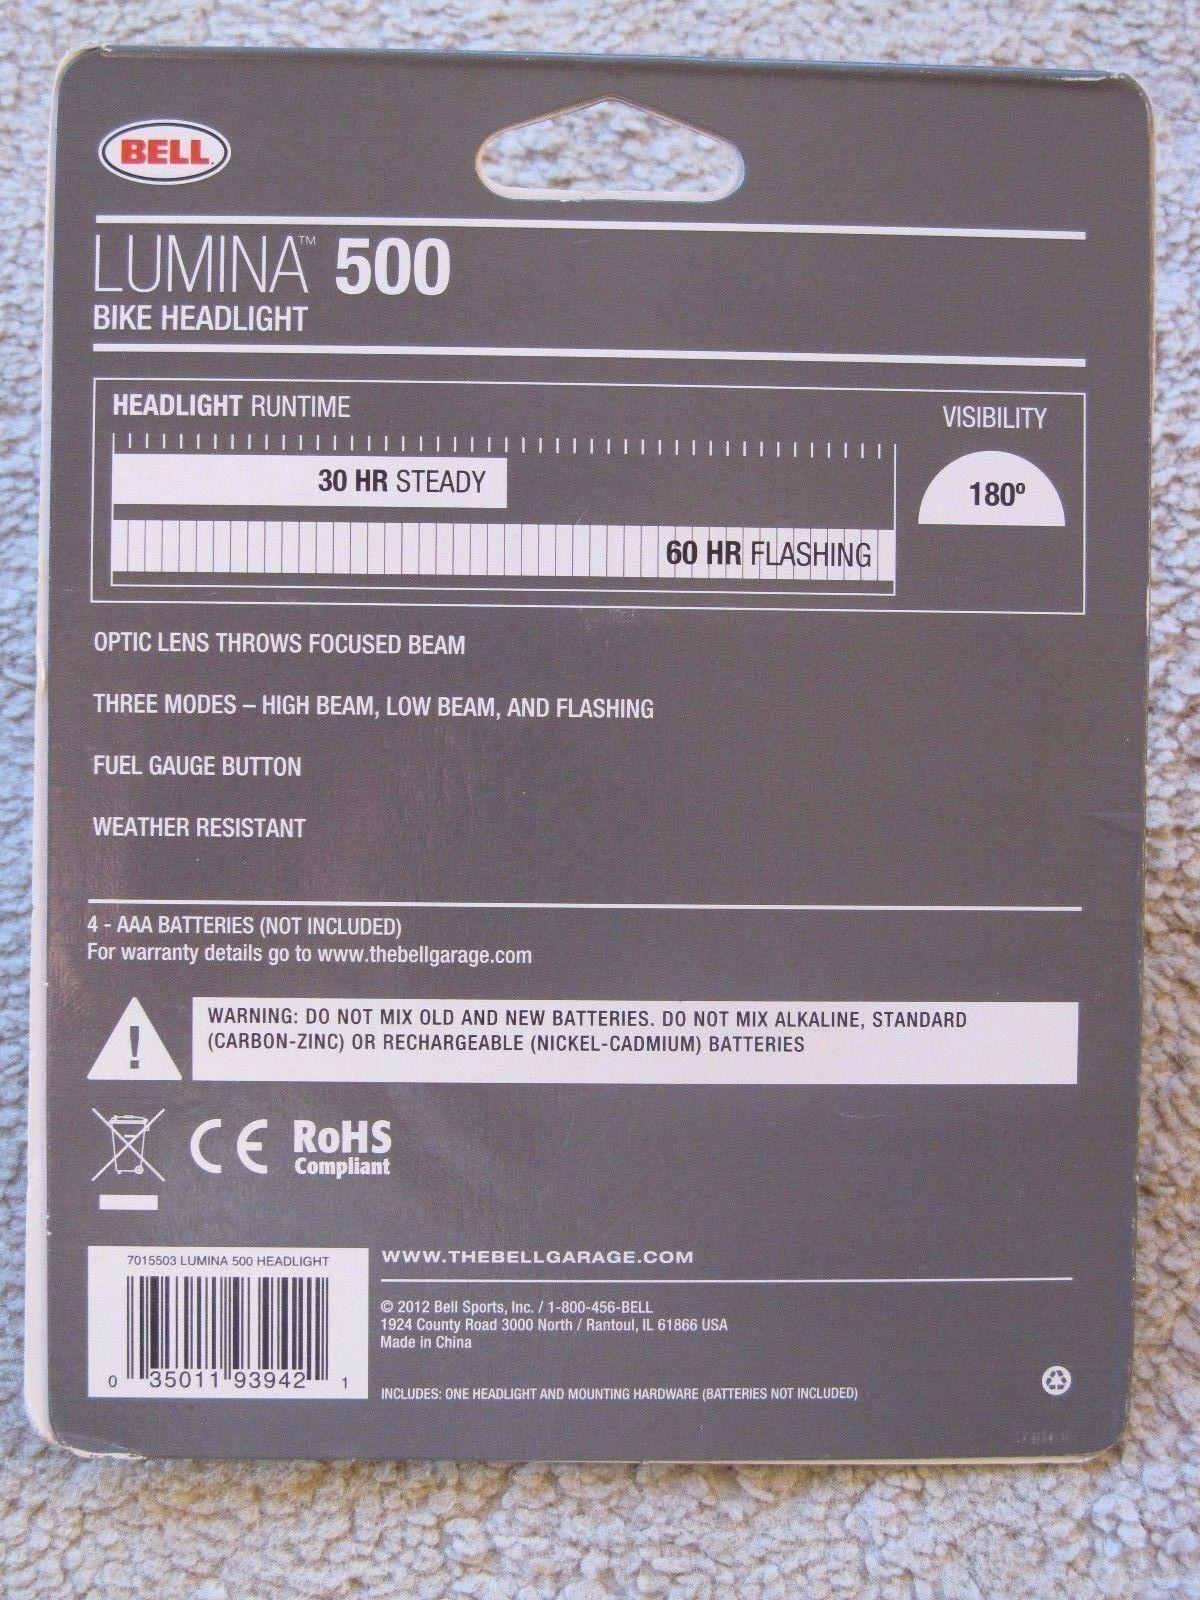 Bell Lumina 500 Bike Headlight  5 Super Brights 3 Light Settings  30 LUMENS